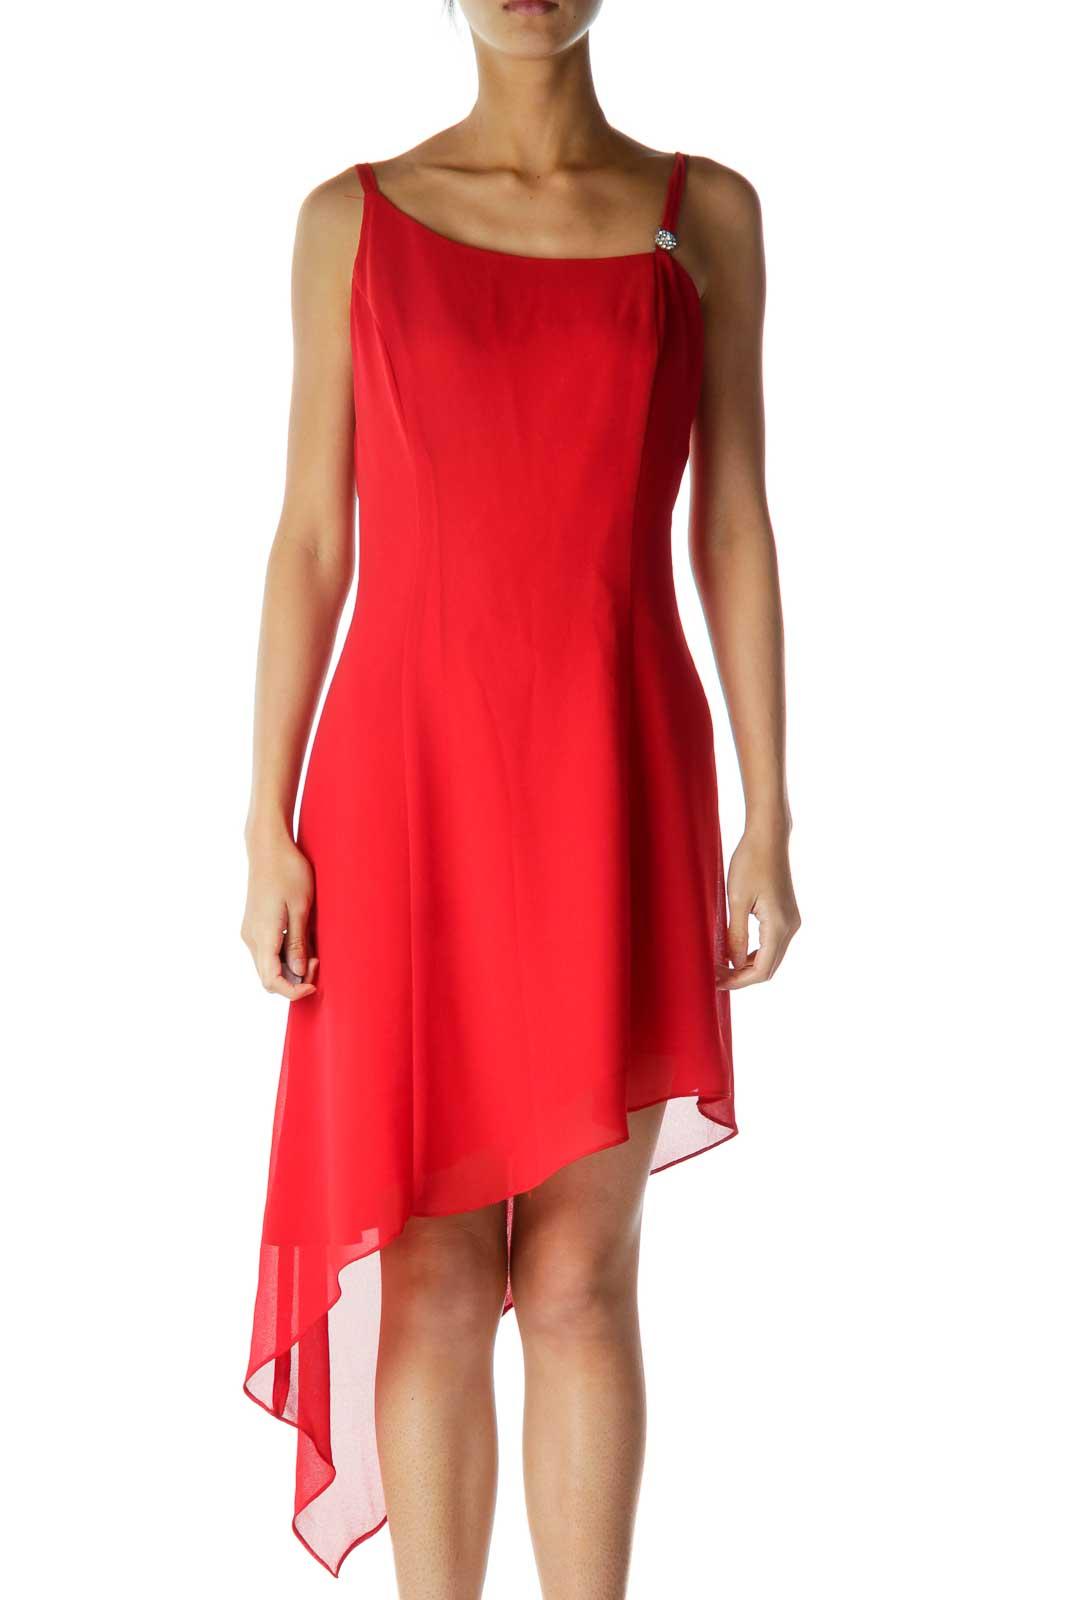 Red Spaghetti Strap Asymmetric Cocktail Dress Front